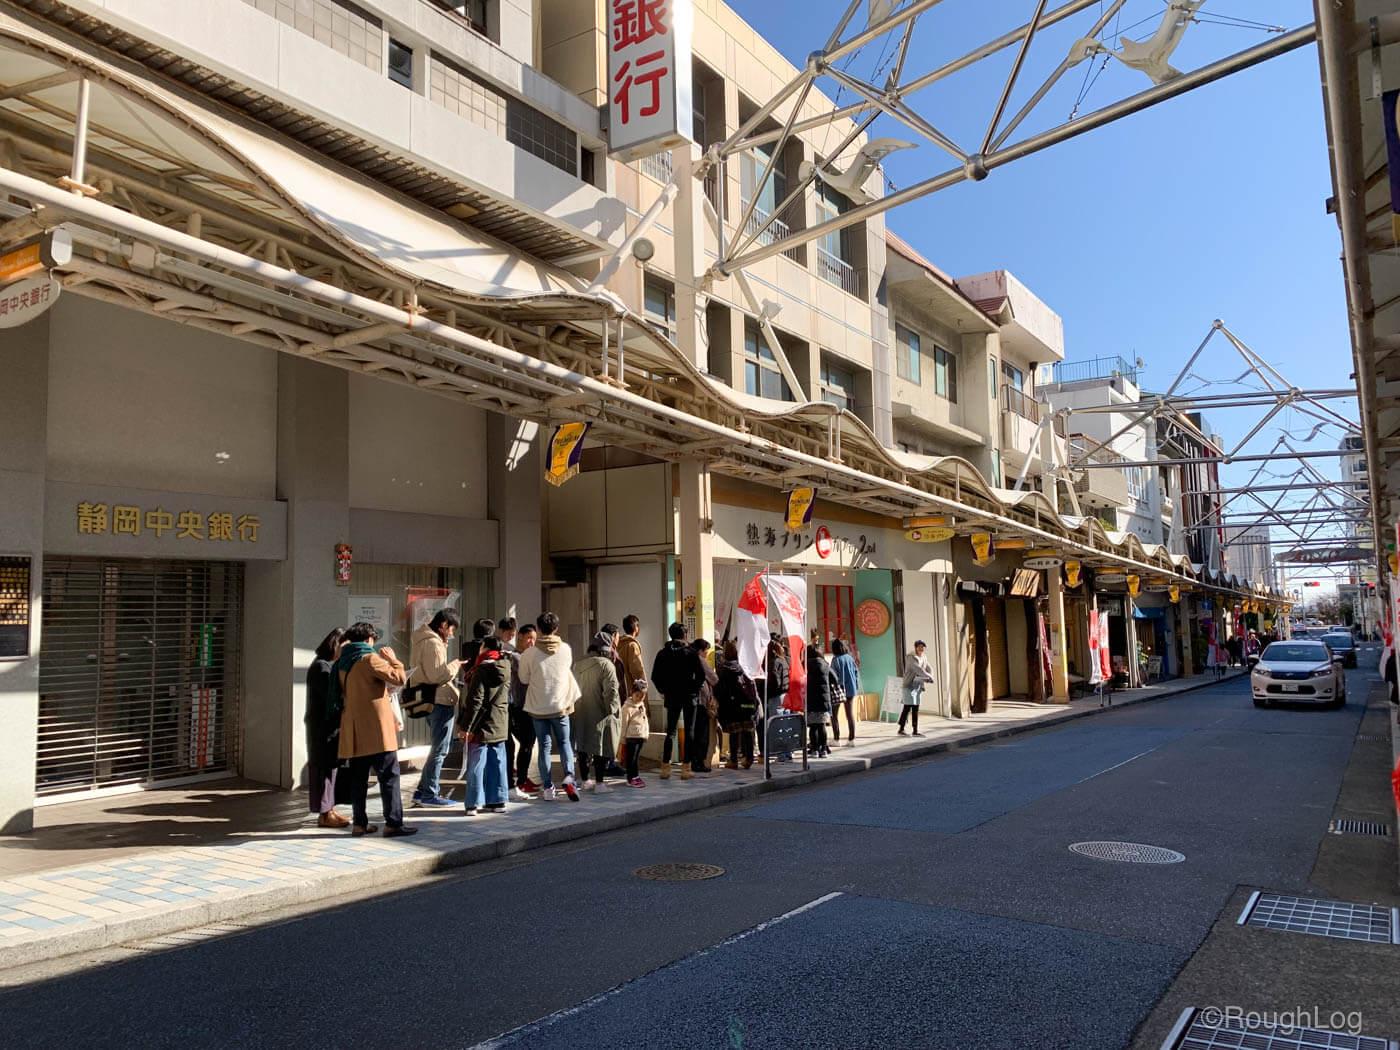 JR熱海駅より徒歩12分。昭和の面影を残す熱海銀座商店街に熱海プリンカフェ2nd(セカンド)はあります